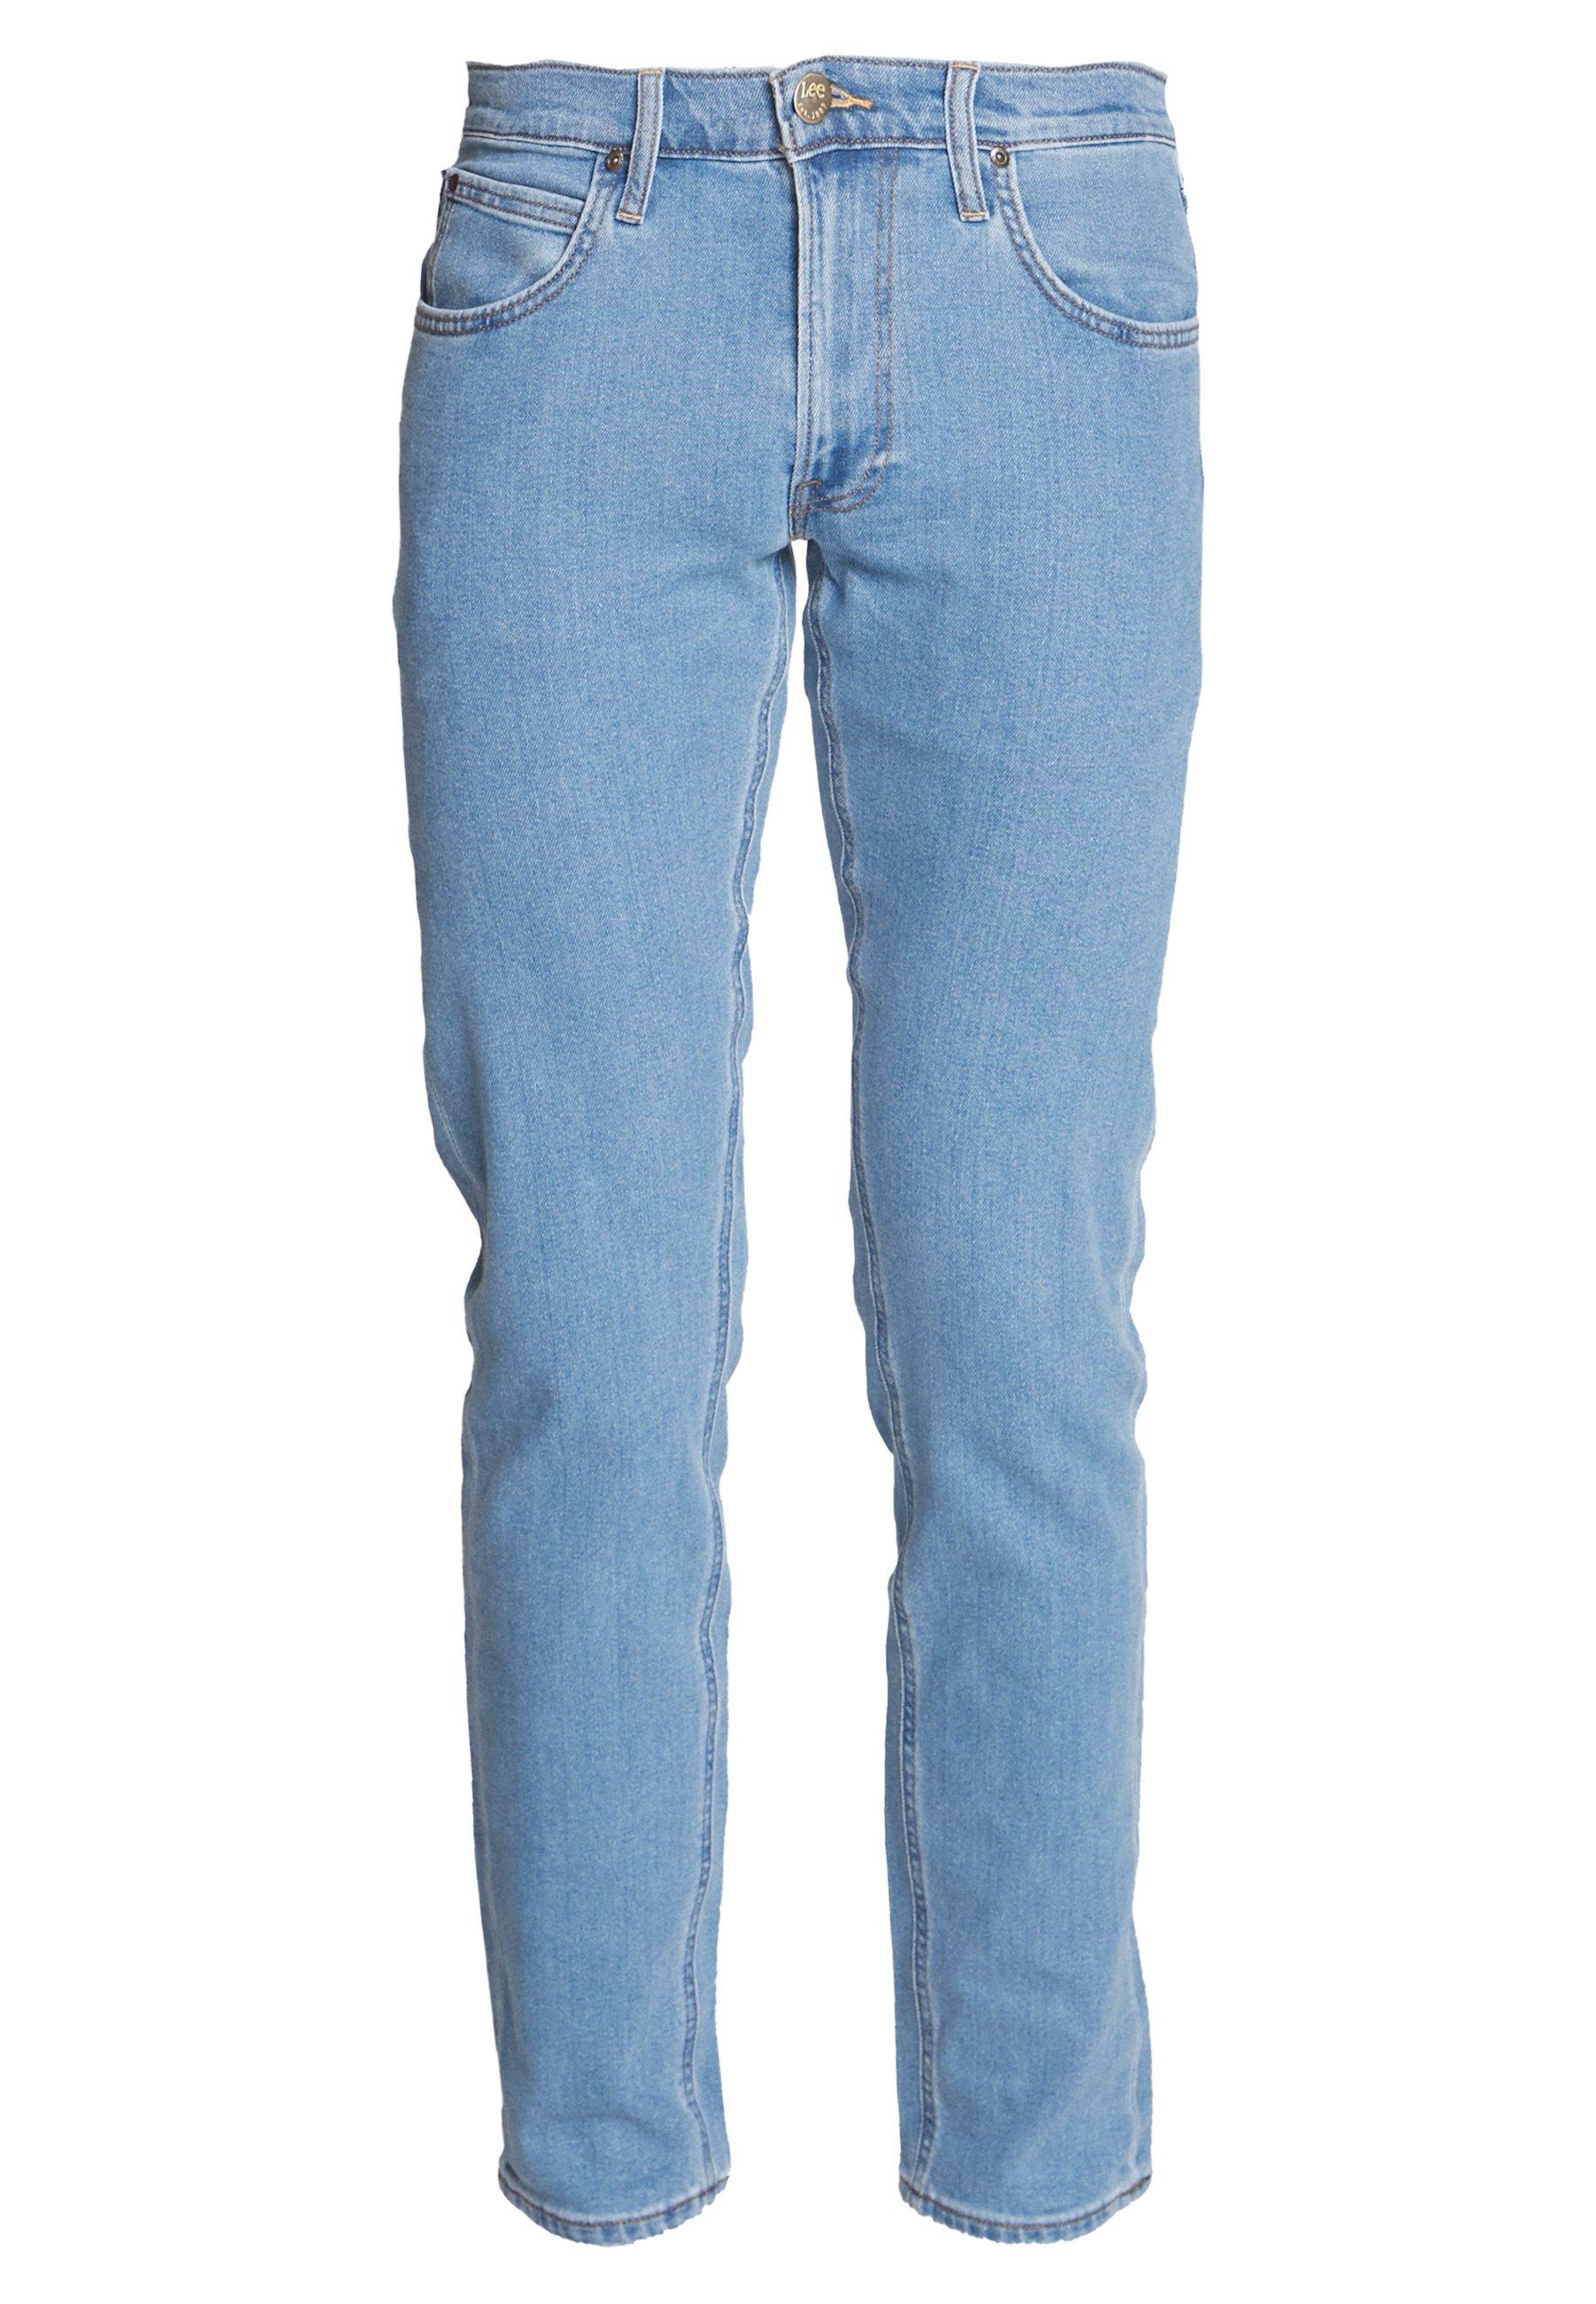 Lee DAREN ZIP FLY - Straight leg jeans - light stonewash